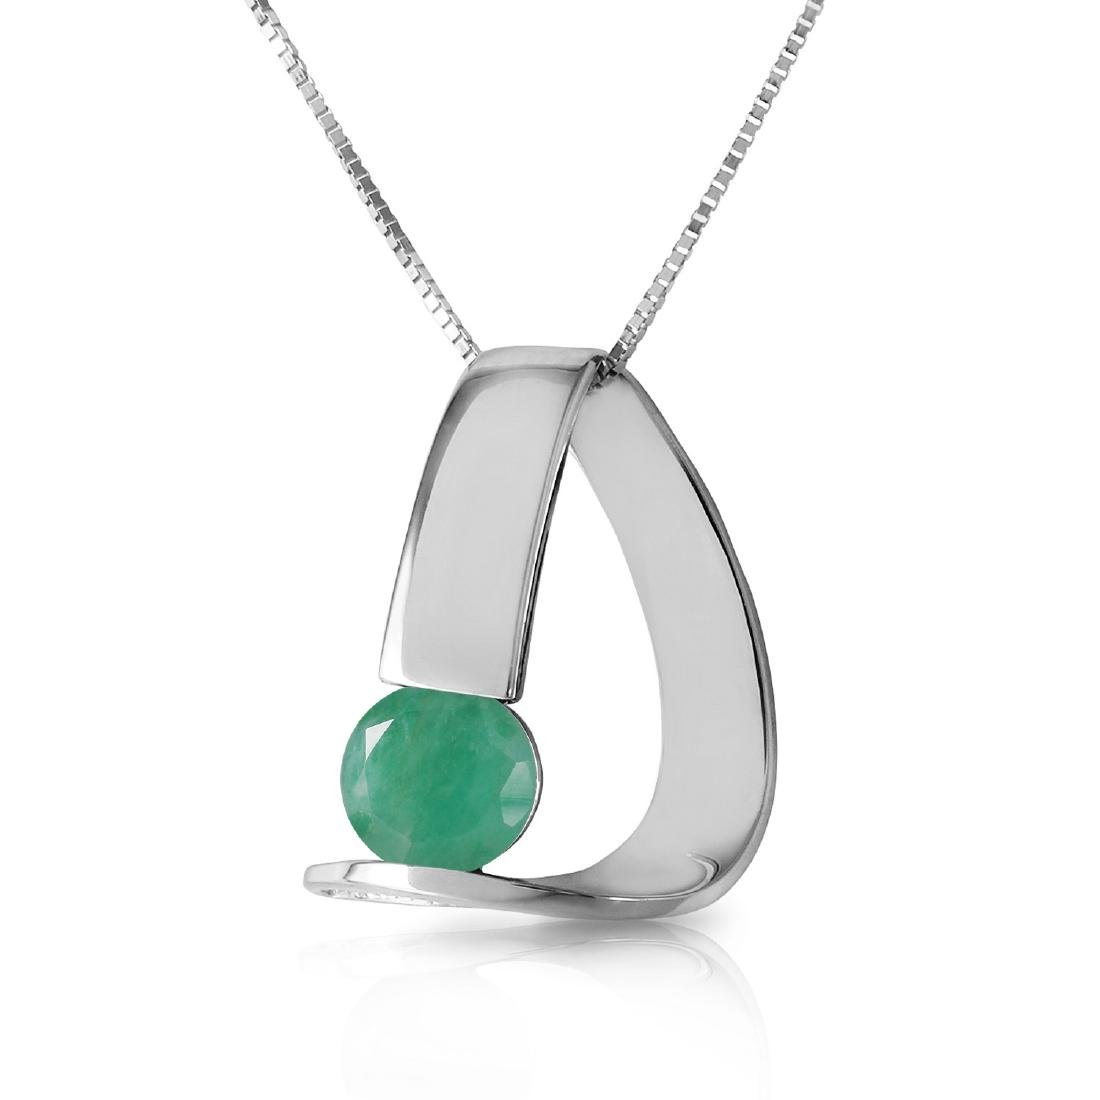 Genuine 1.65 ctw Emerald Necklace Jewelry 14KT White